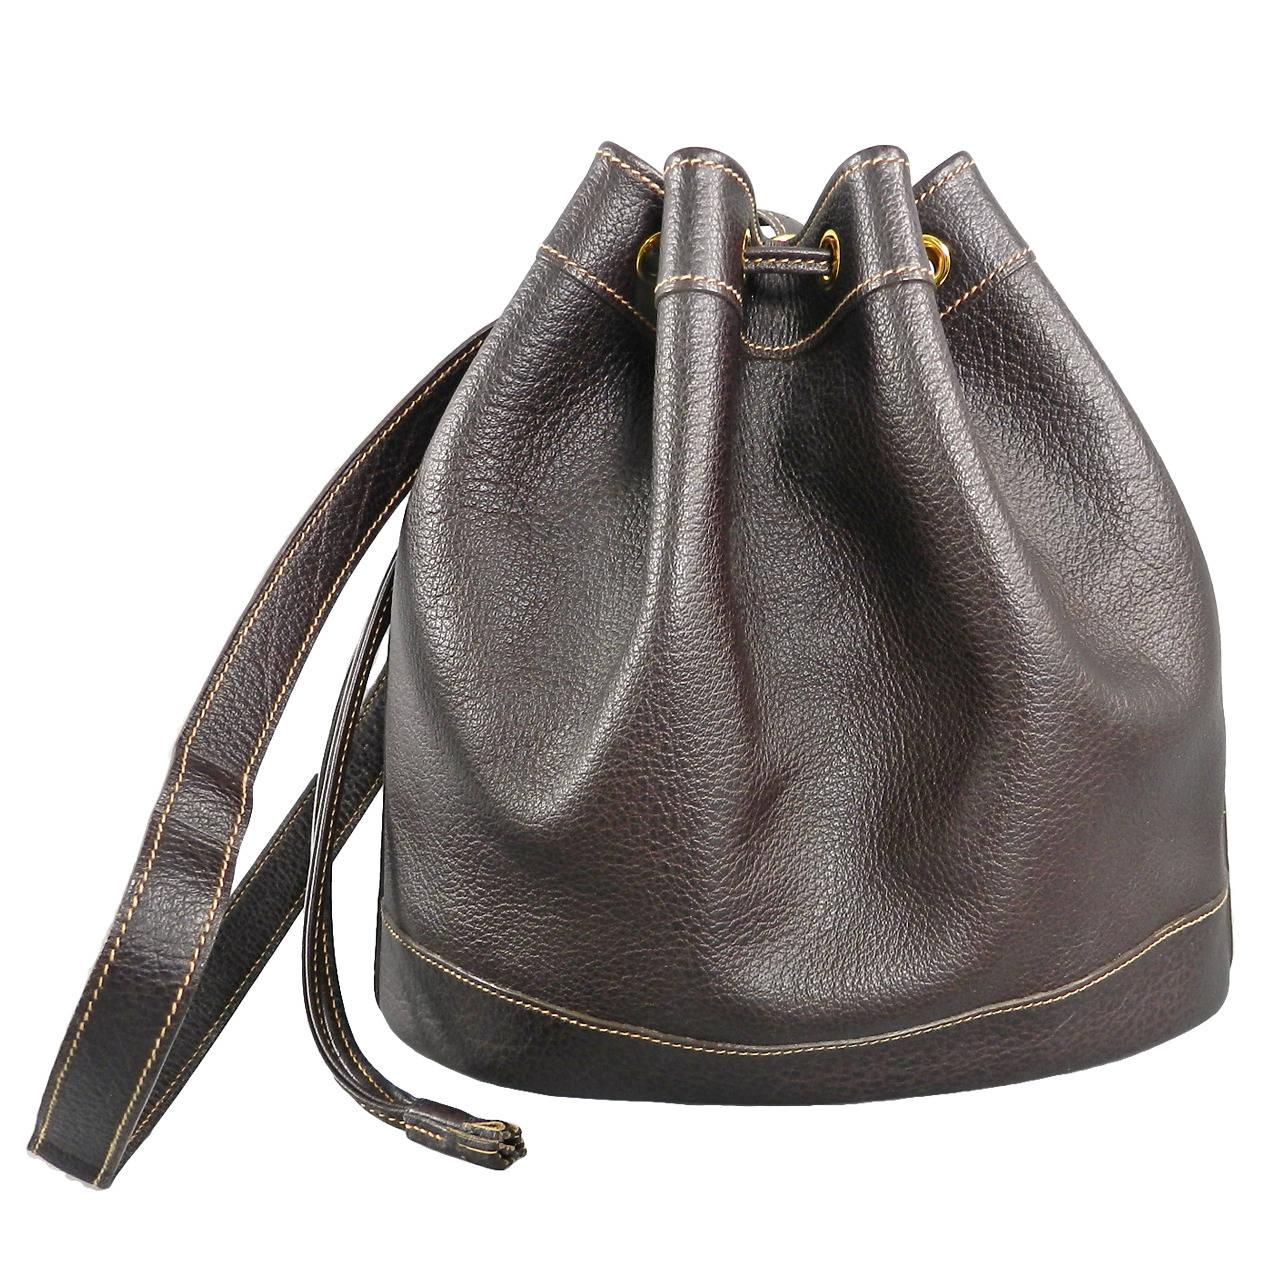 Hermes Vintage 1999 Dark Brown Leather Market Bucket Bag at 1stdibs